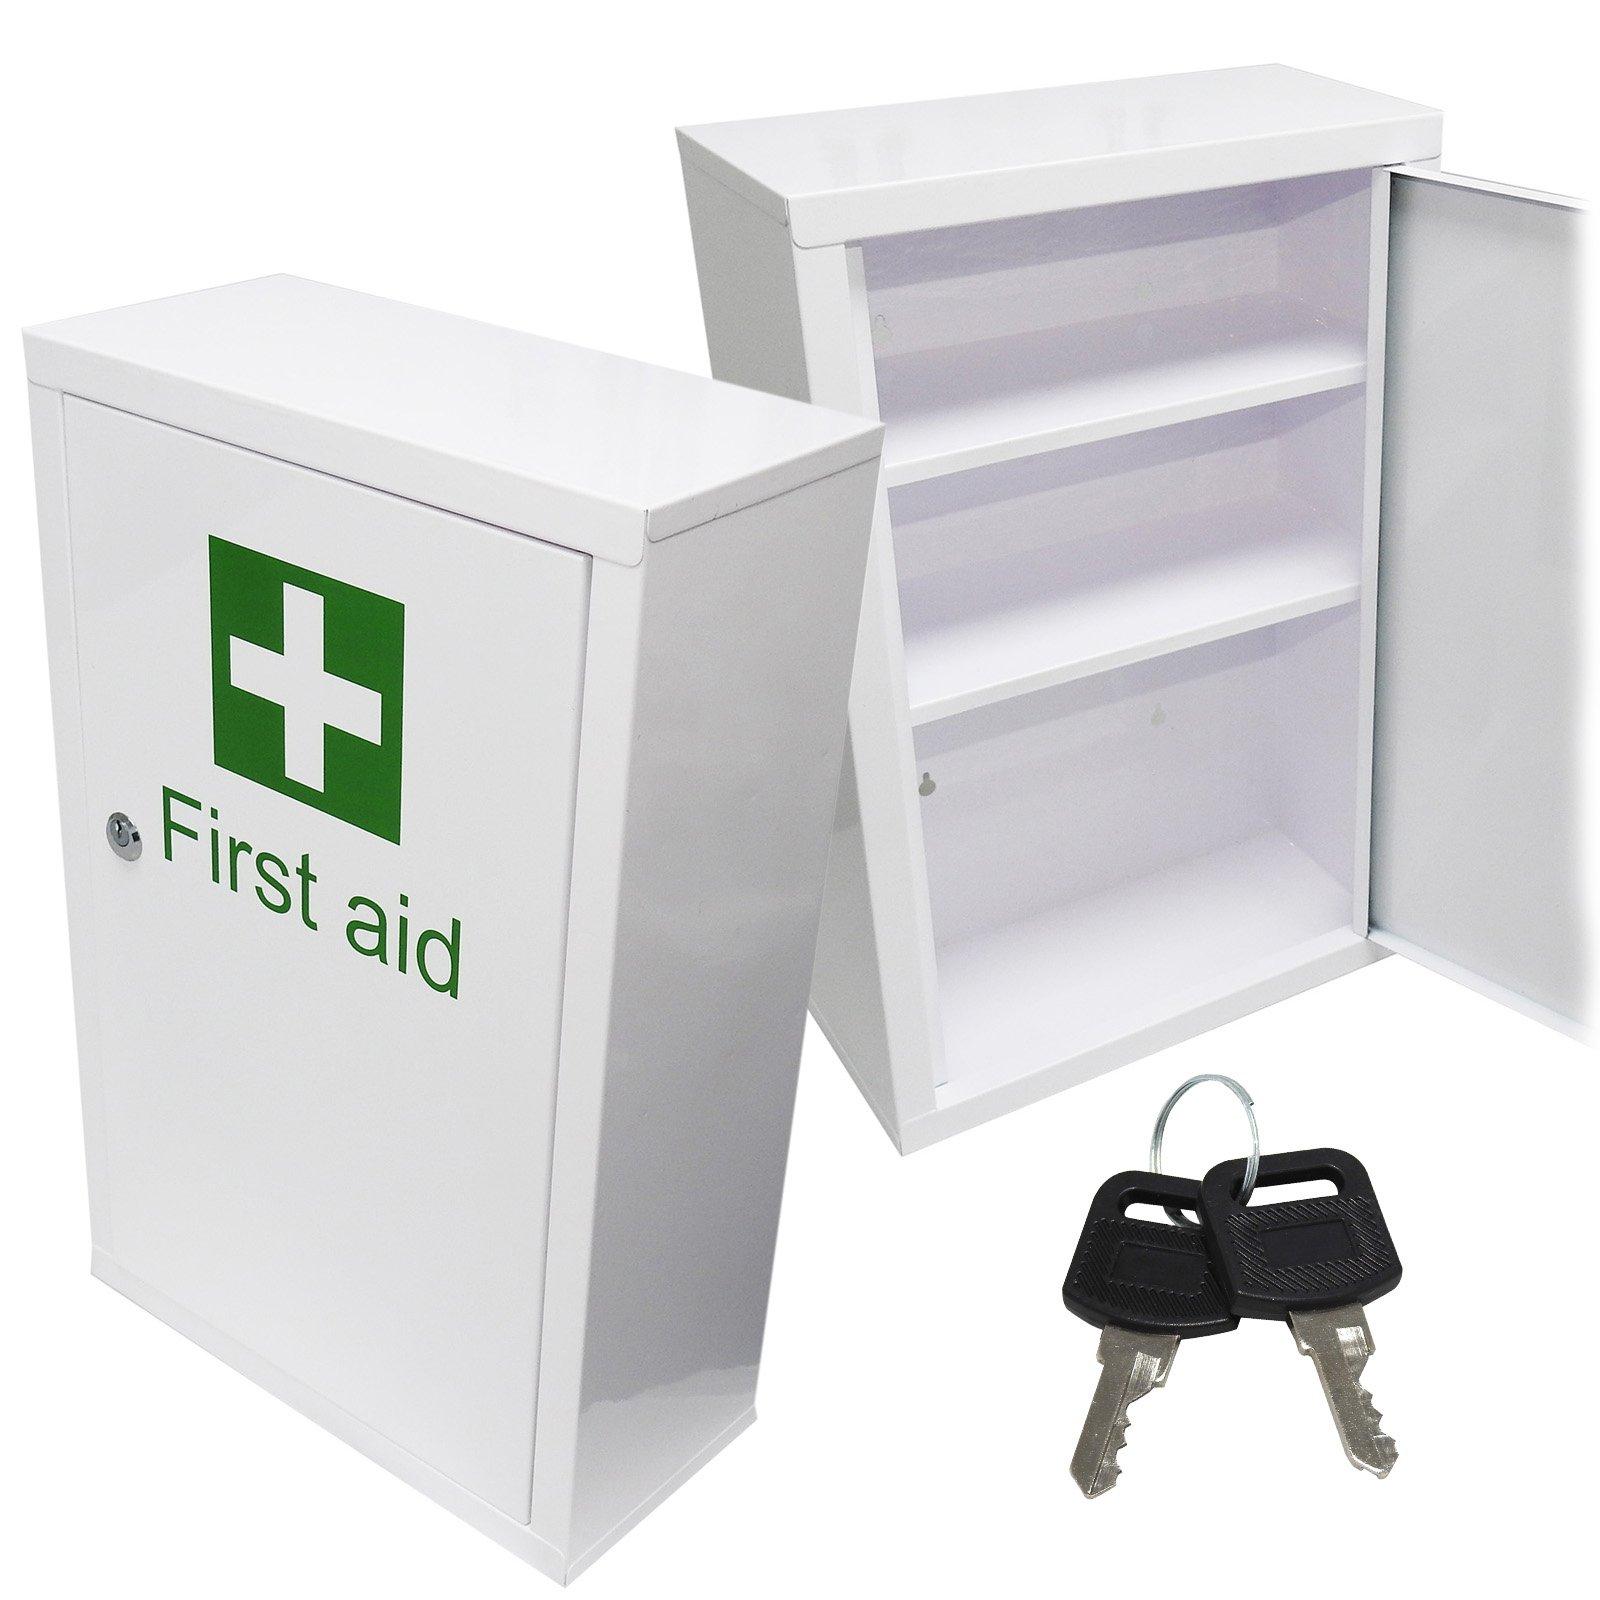 Qualicare Large Medicine First Aid Medical Wall Mount Cabinet Cupboard Locker Plus Keys, 1 kg